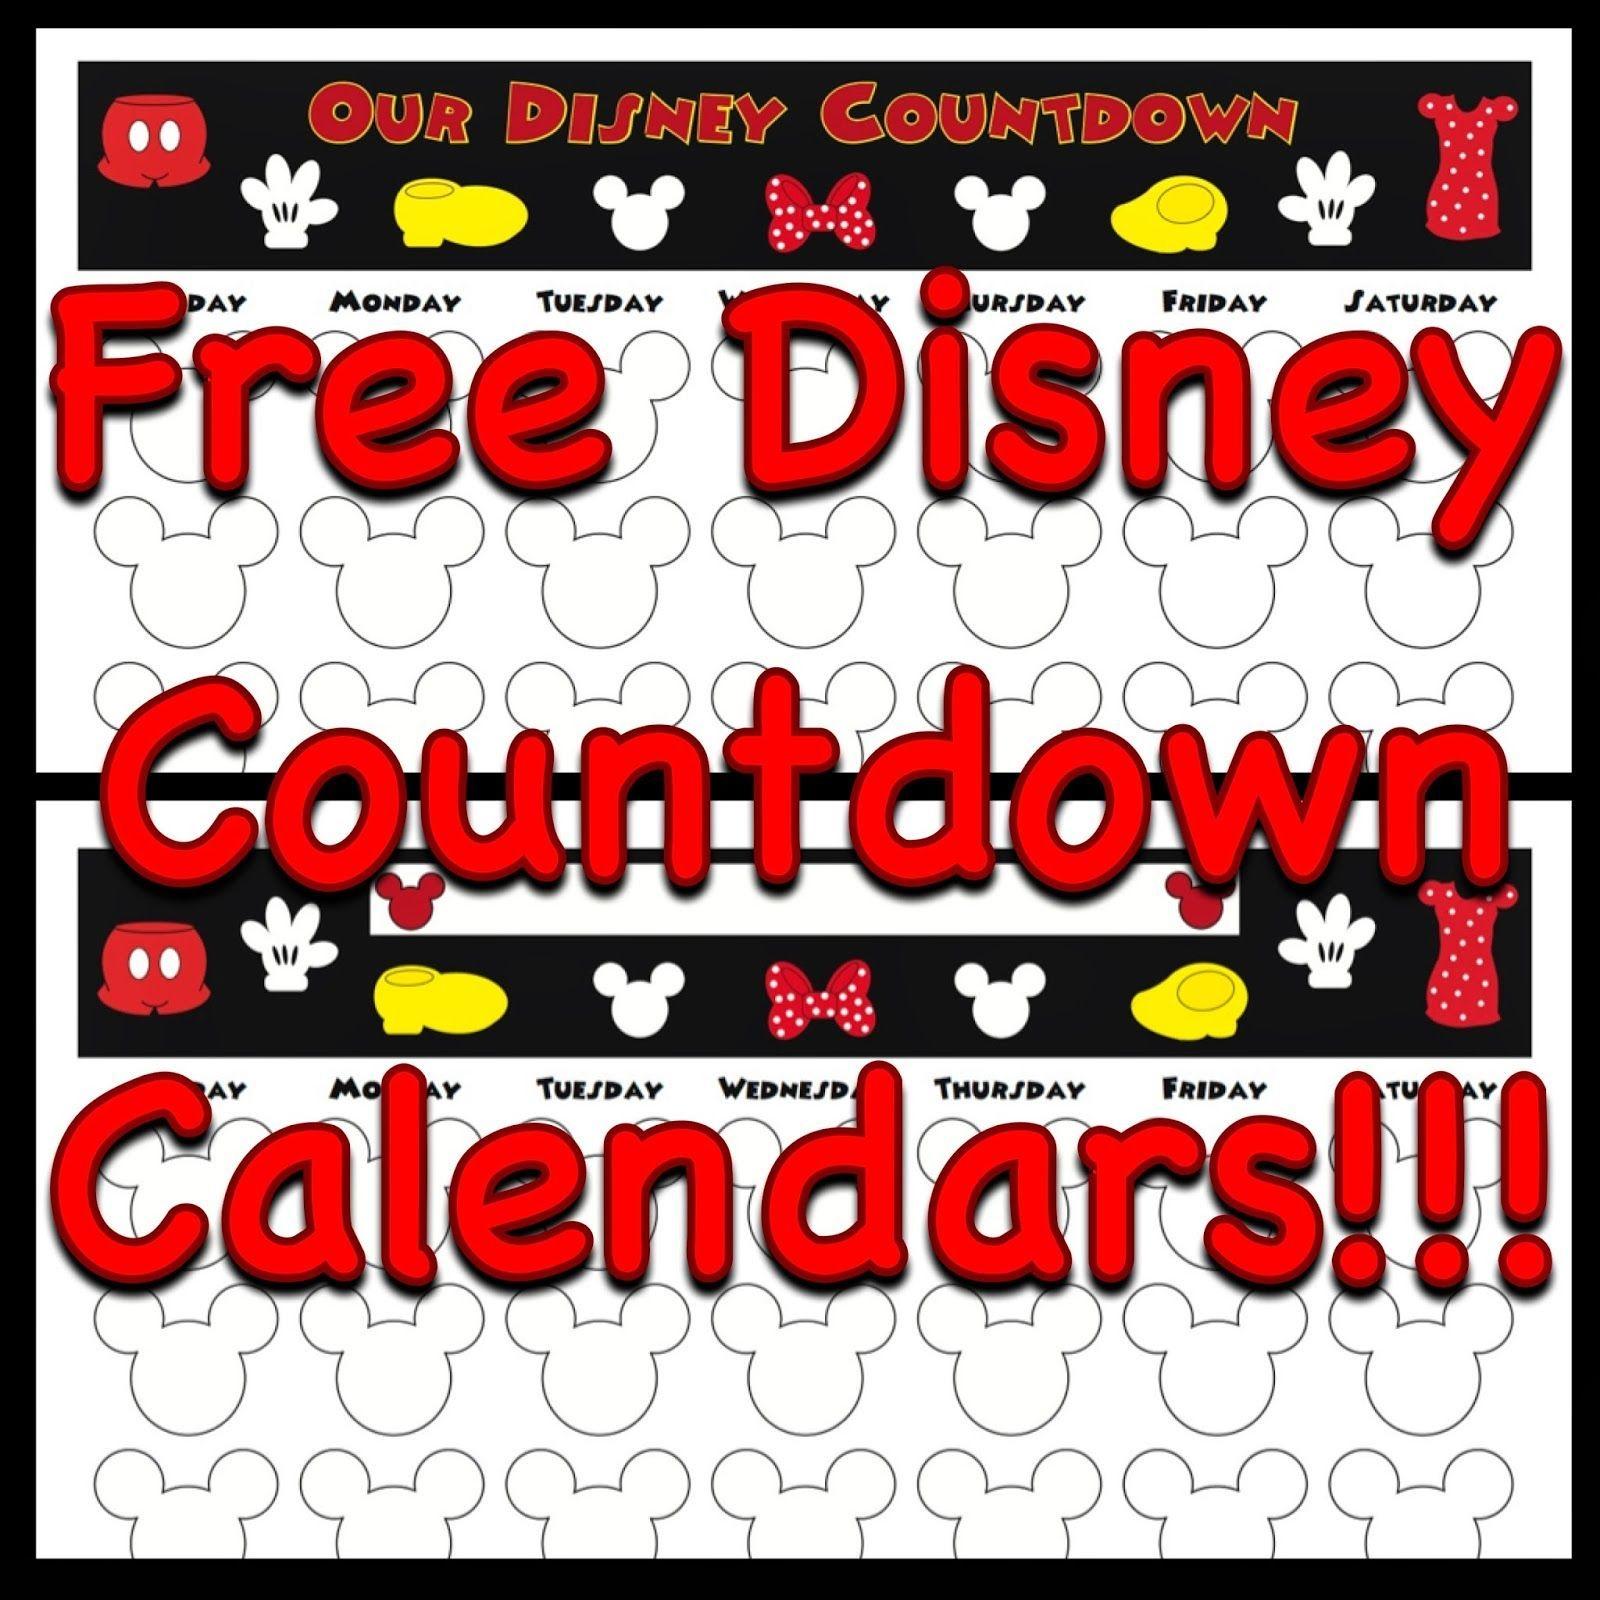 Countdown Calendars   Disney Calendar, Disney Countdown